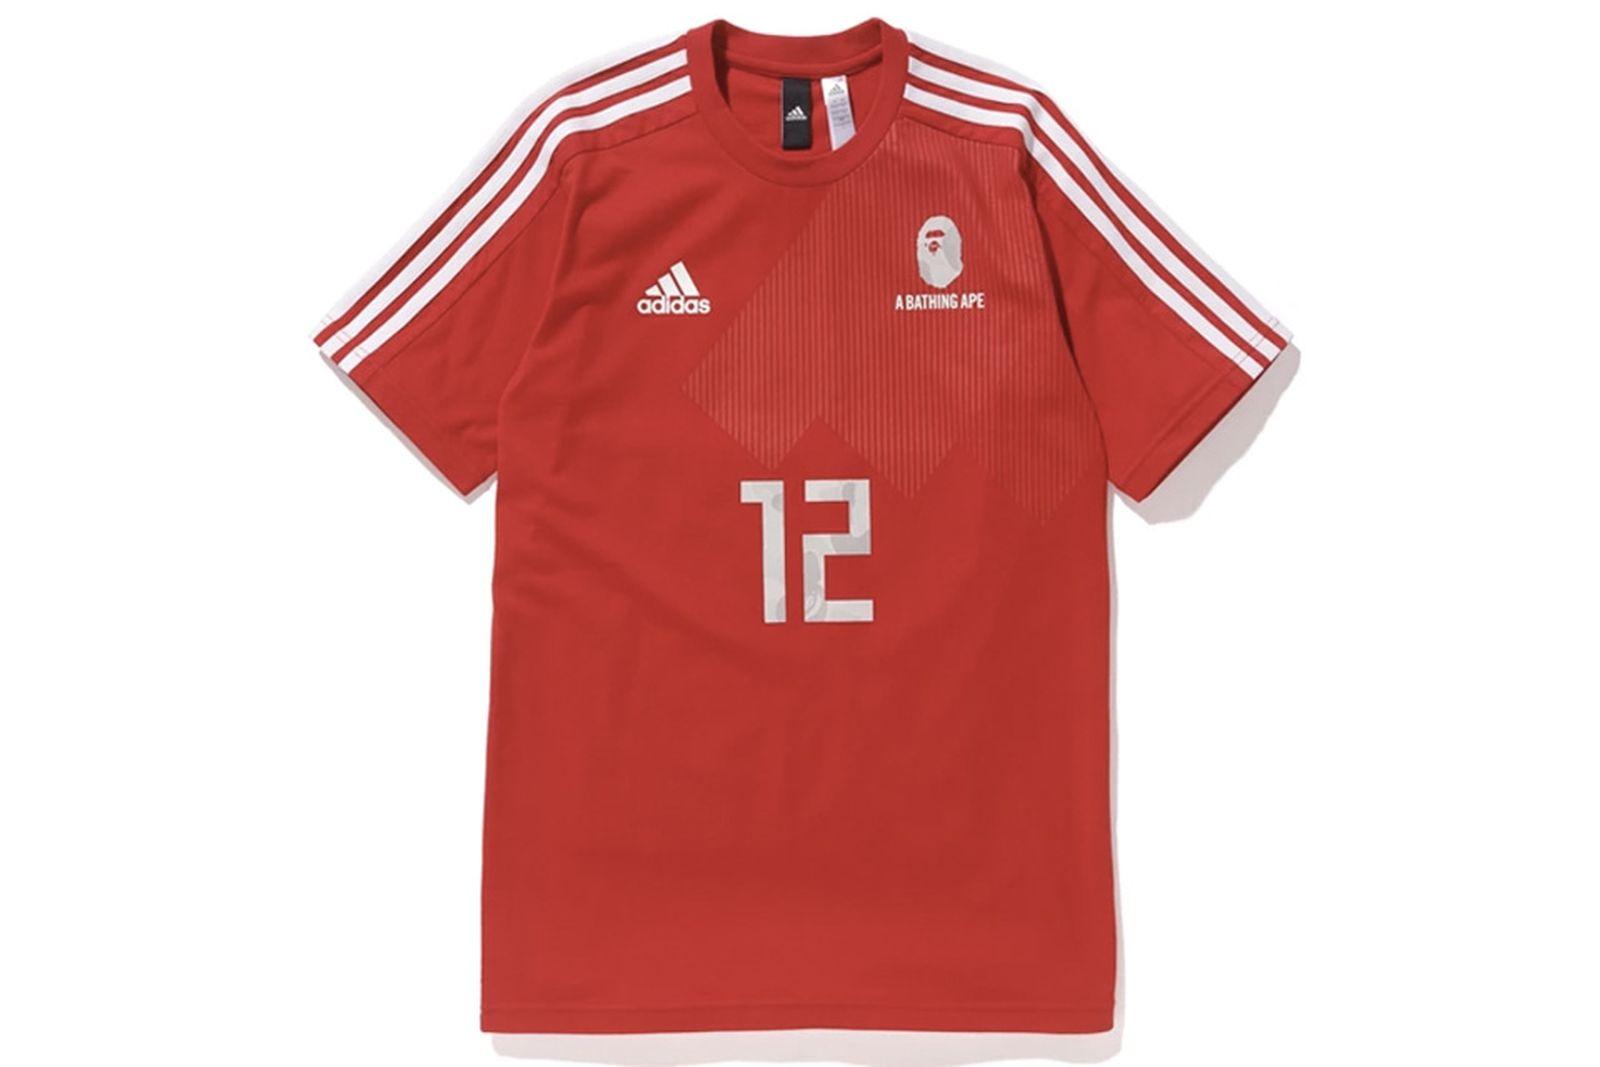 bape adidas football kit 2018 FIFA World Cup adidas Winning Collection